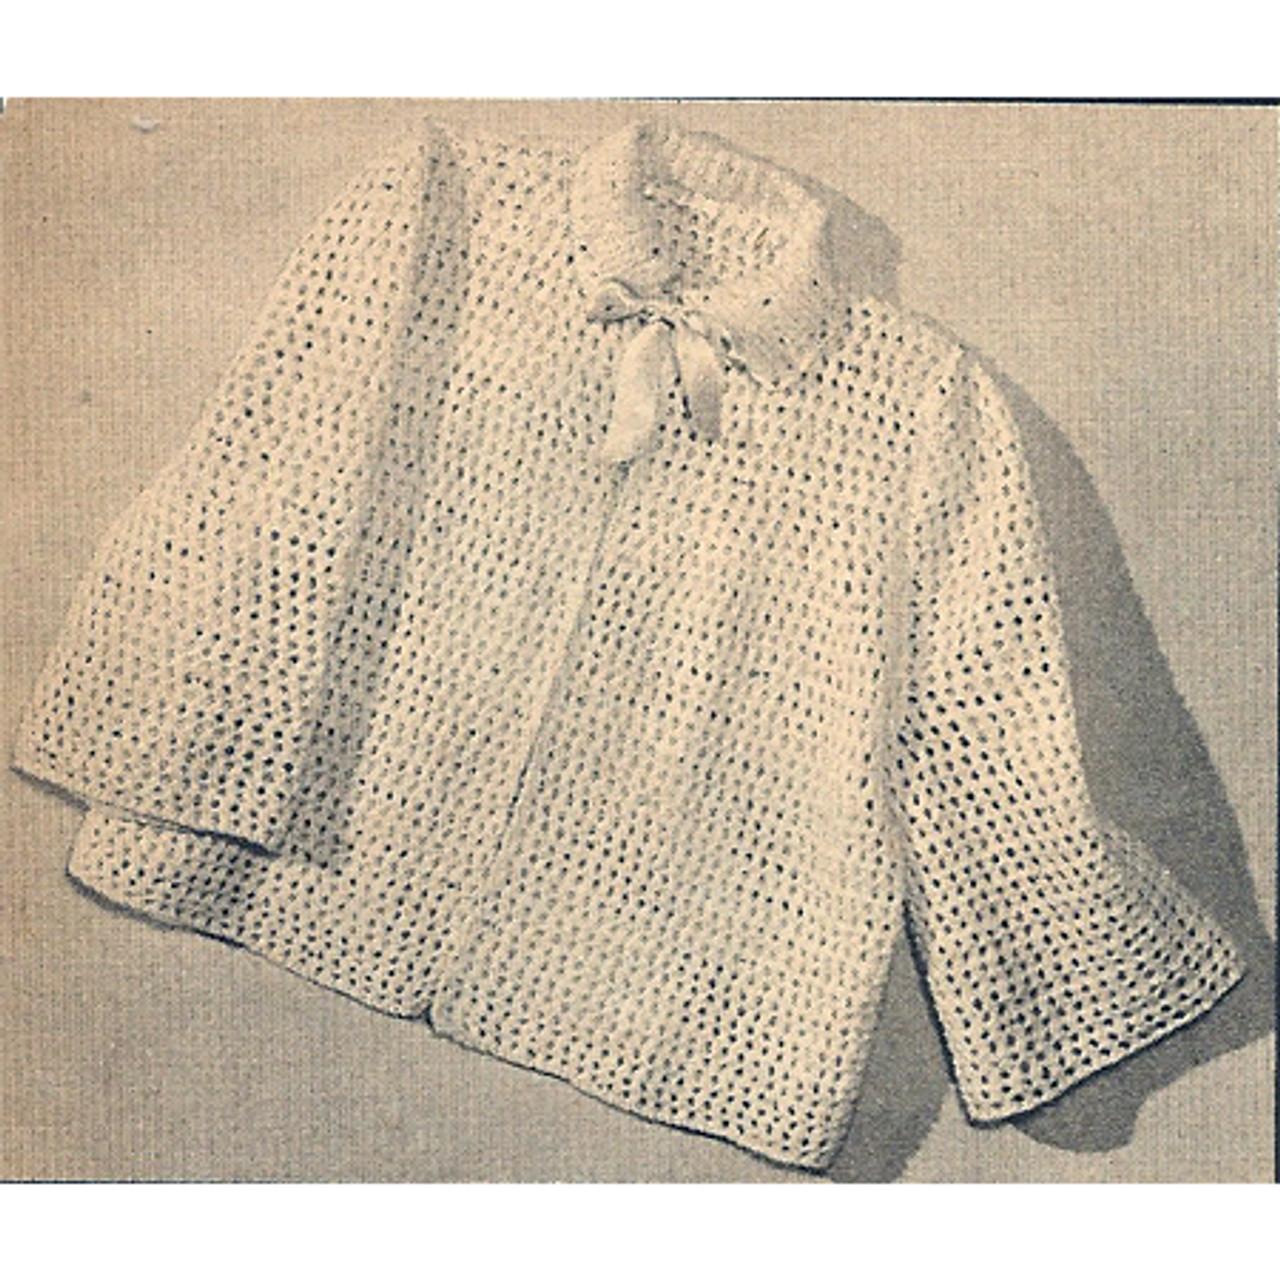 Collared Bedjacket Knitting pattern